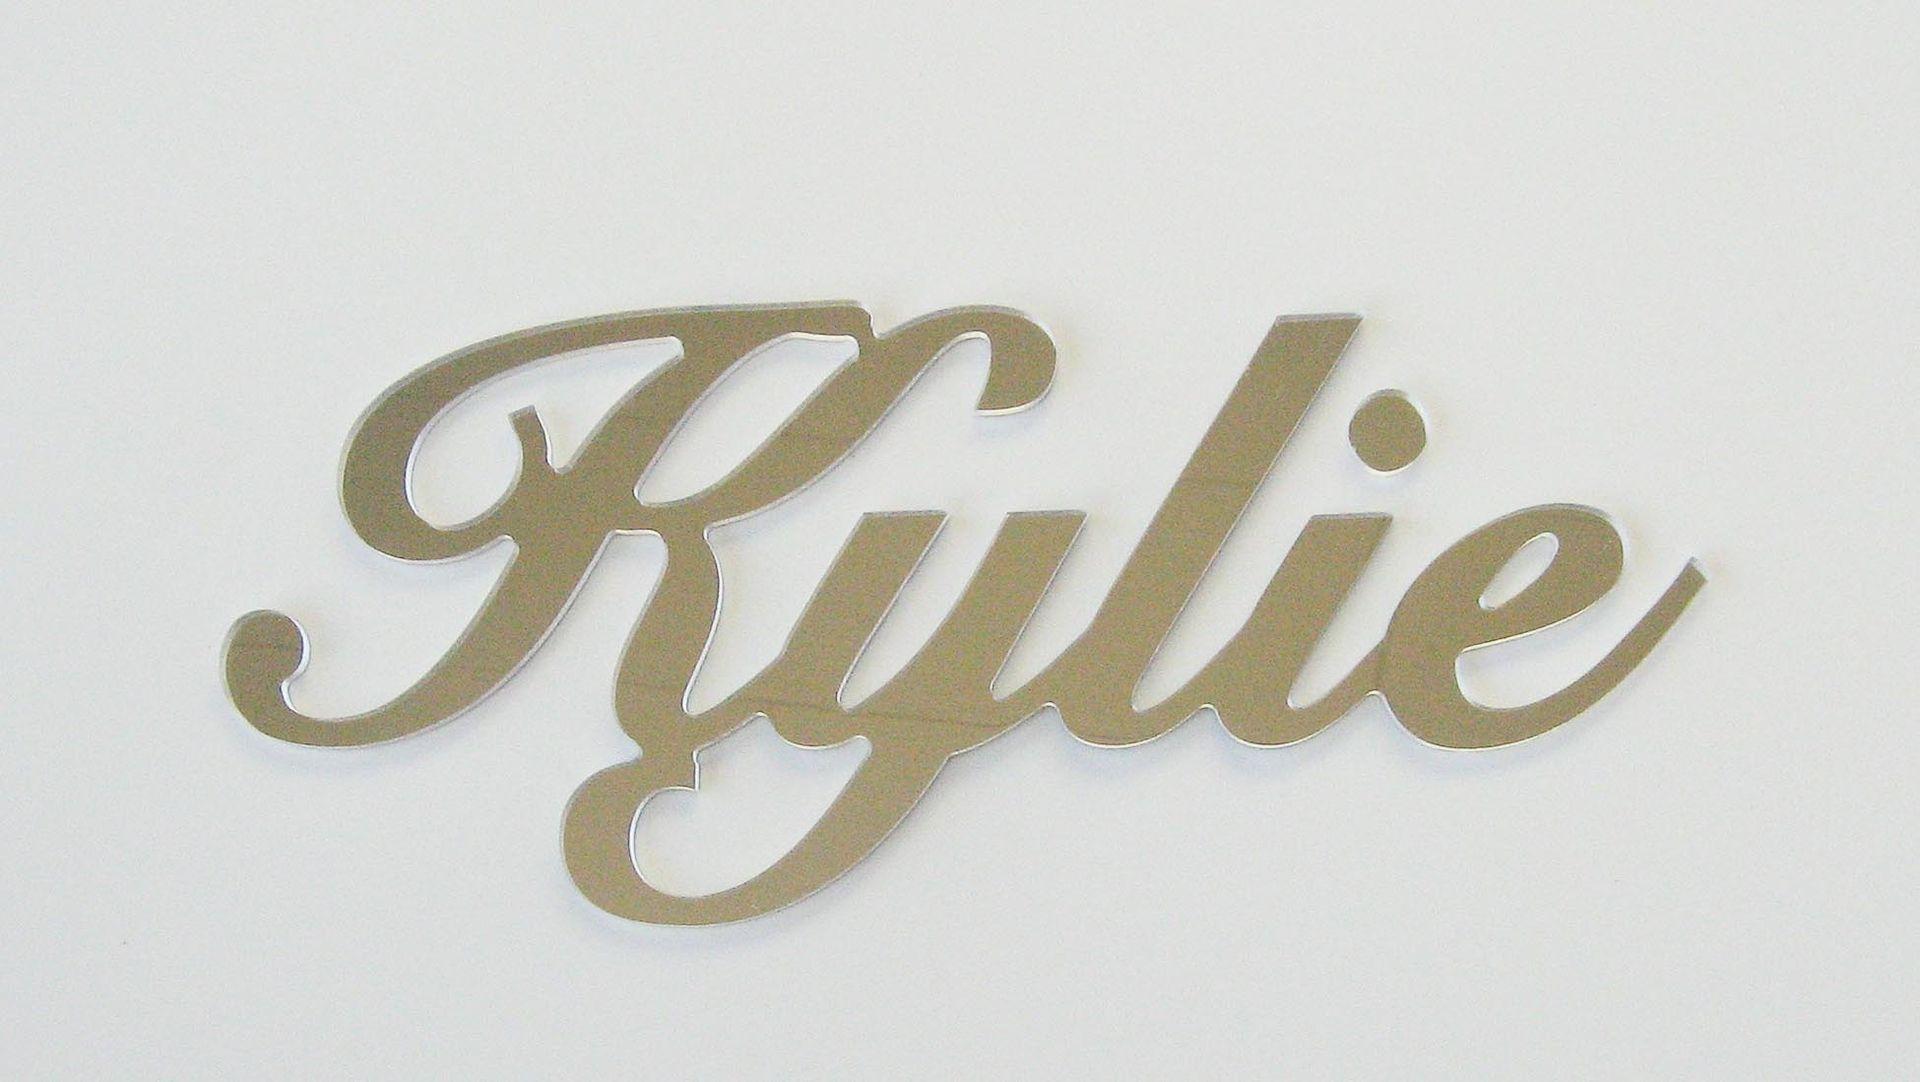 Handmade custom mirror words by vanilla design ltd custommade custom made custom mirror words amipublicfo Images